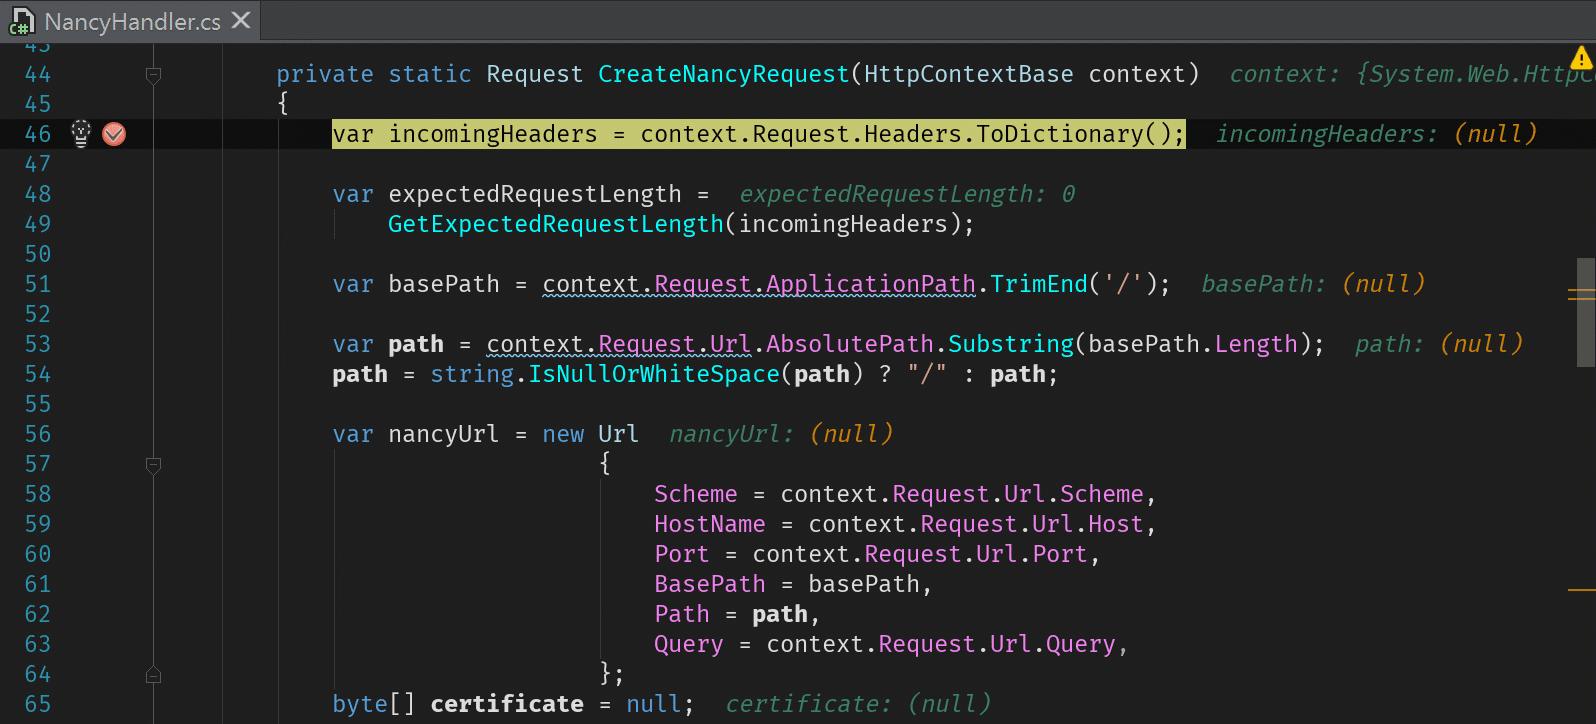 Rider debugger displays variable value in editor